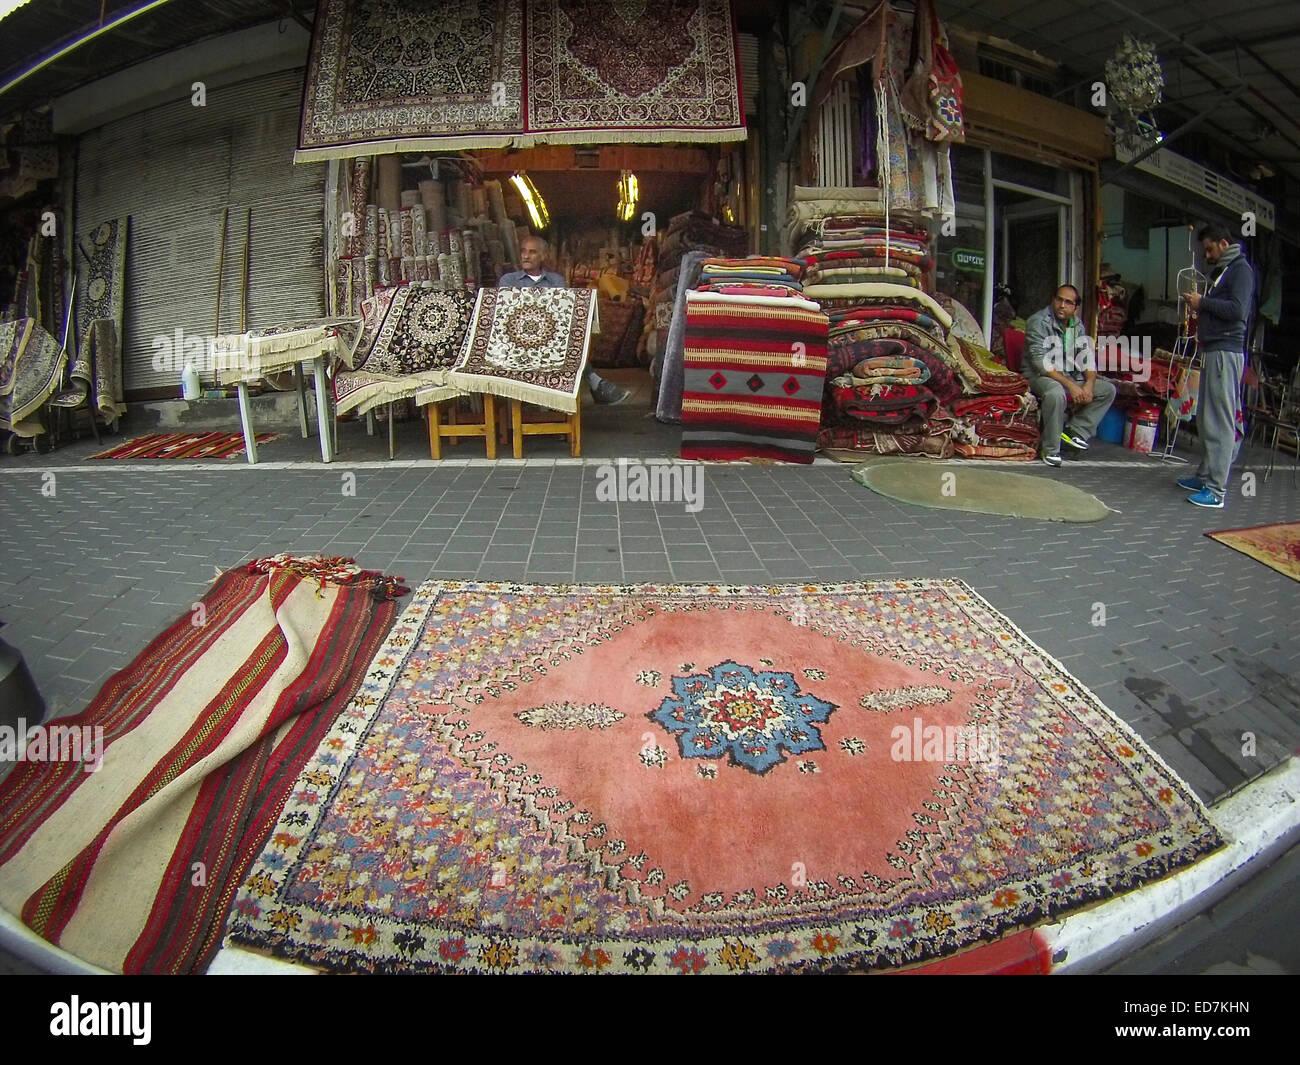 Carpets for sale at the Jaffa Flea Market, Jaffa, Israel. - Stock Image